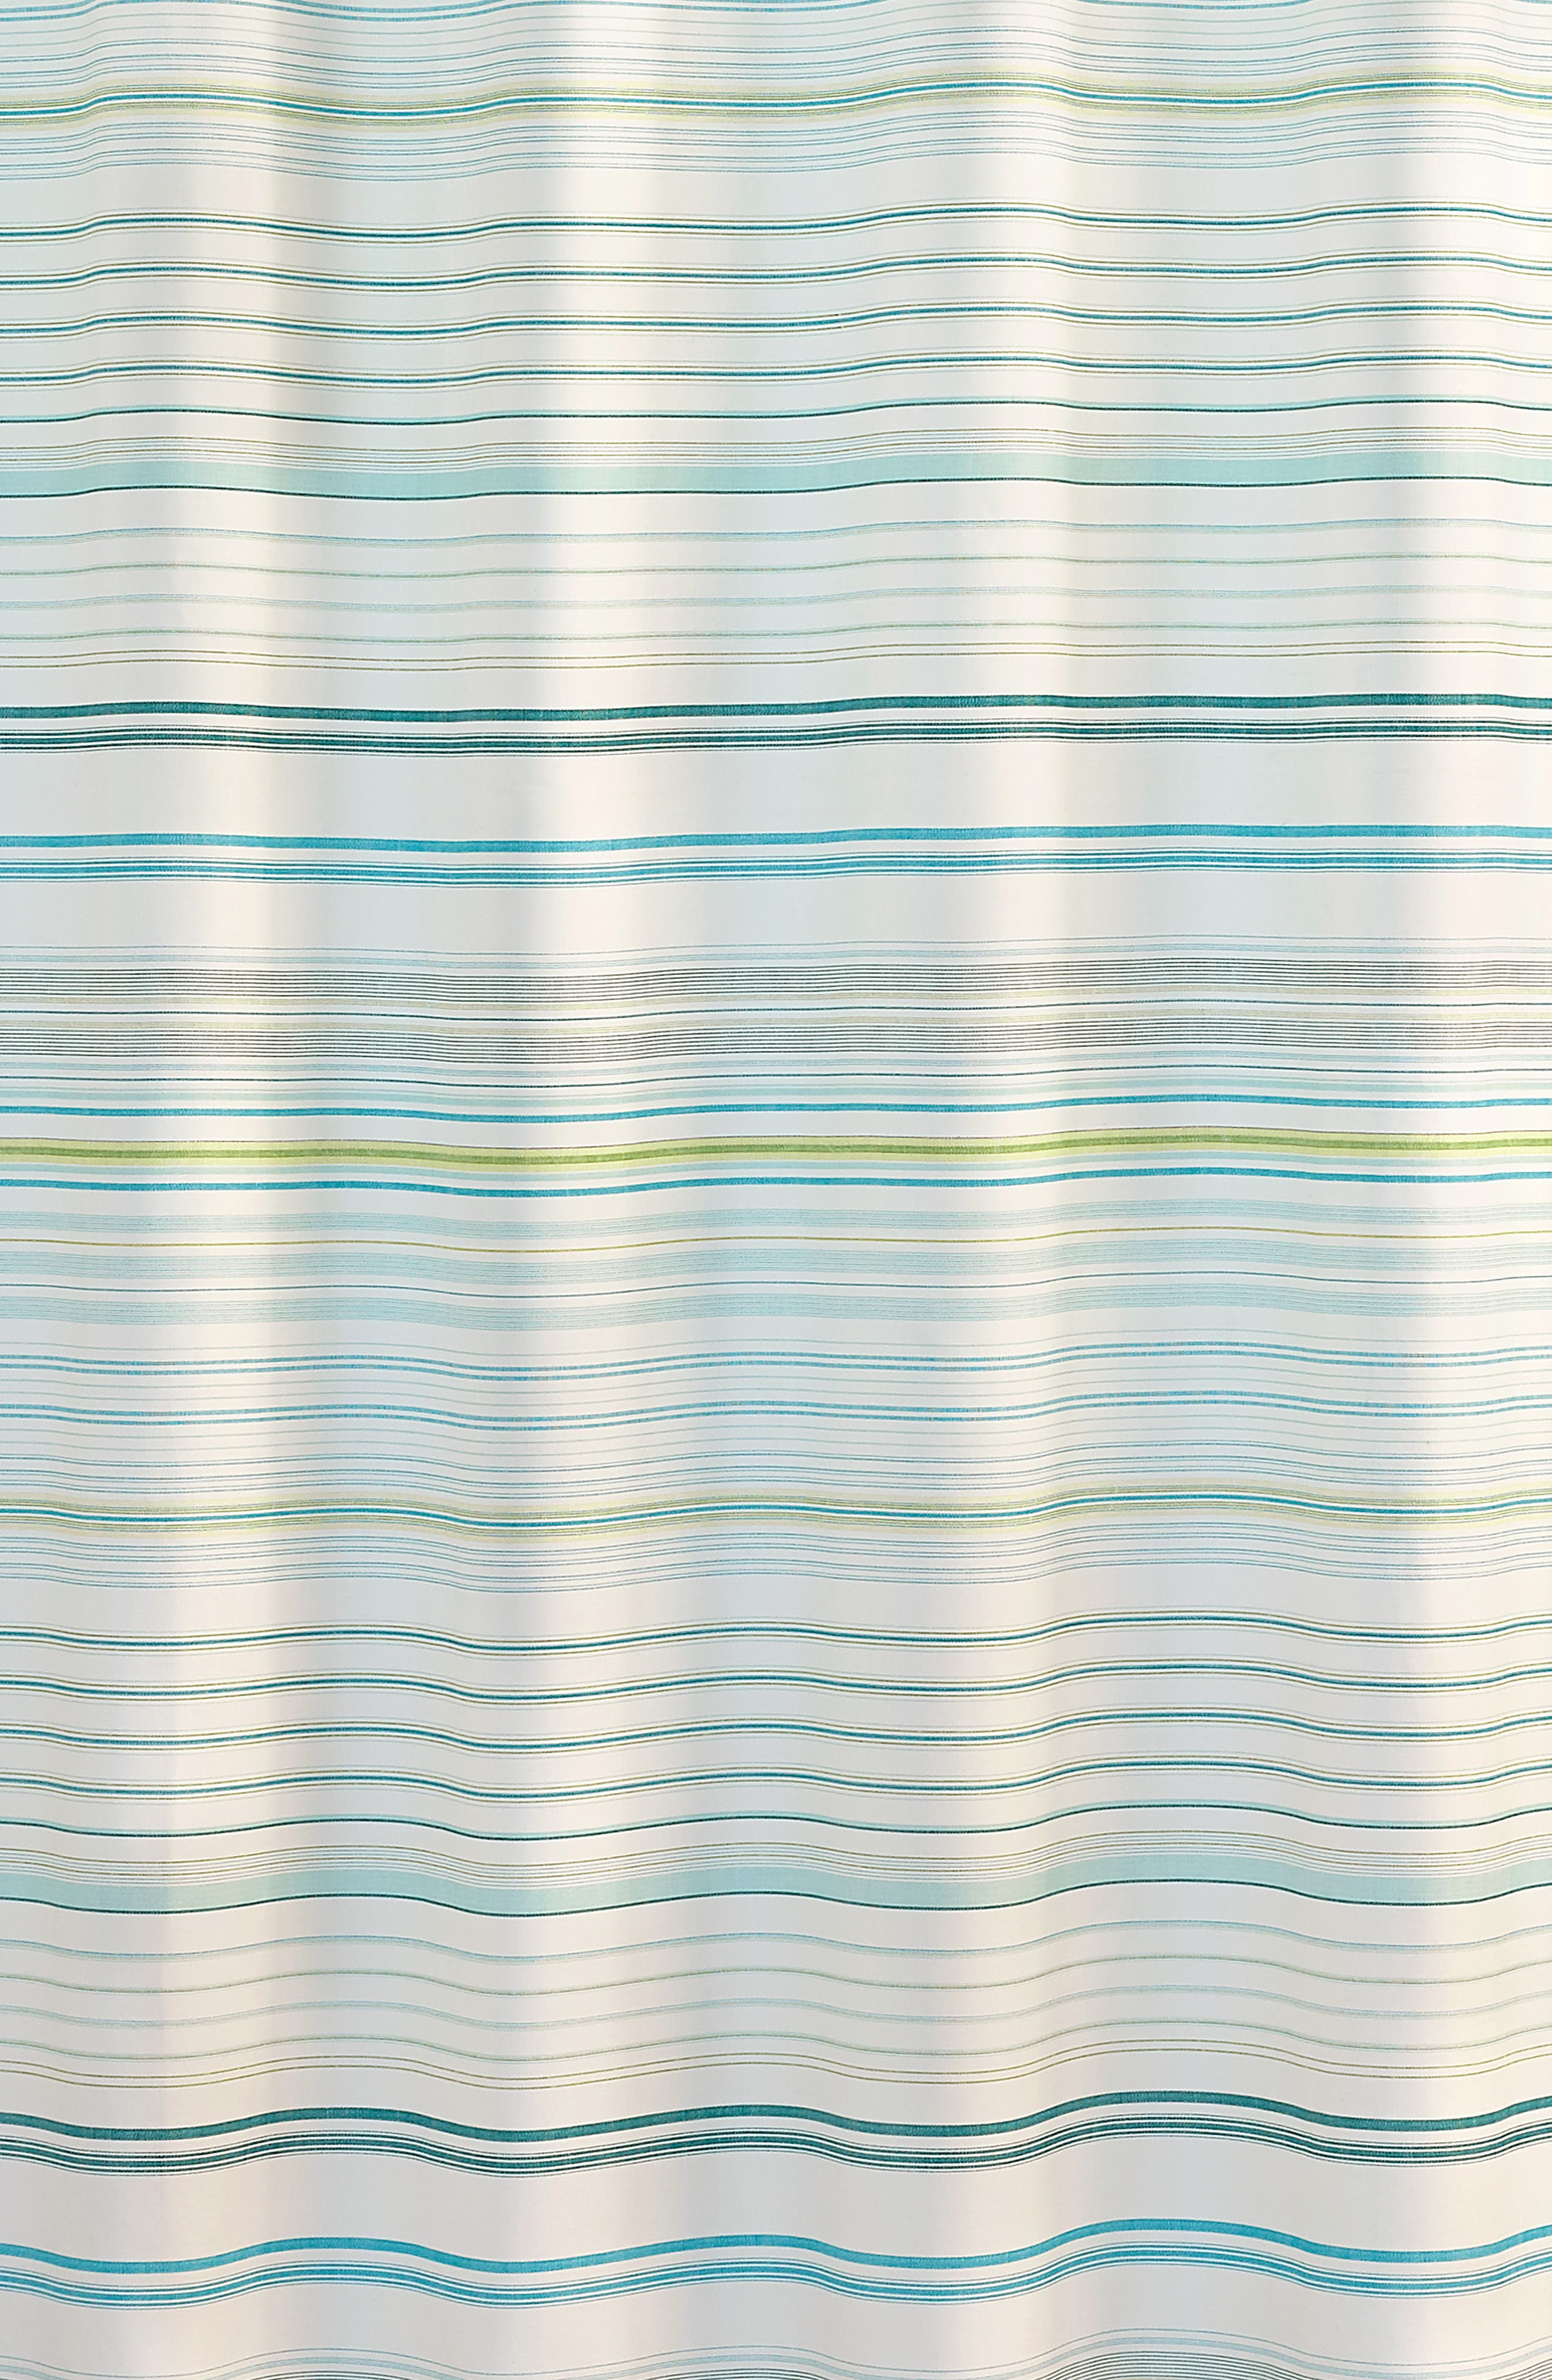 TOMMY BAHAMA,                             La Scala Breezer Shower Curtain,                             Alternate thumbnail 2, color,                             PASTEL GREEN